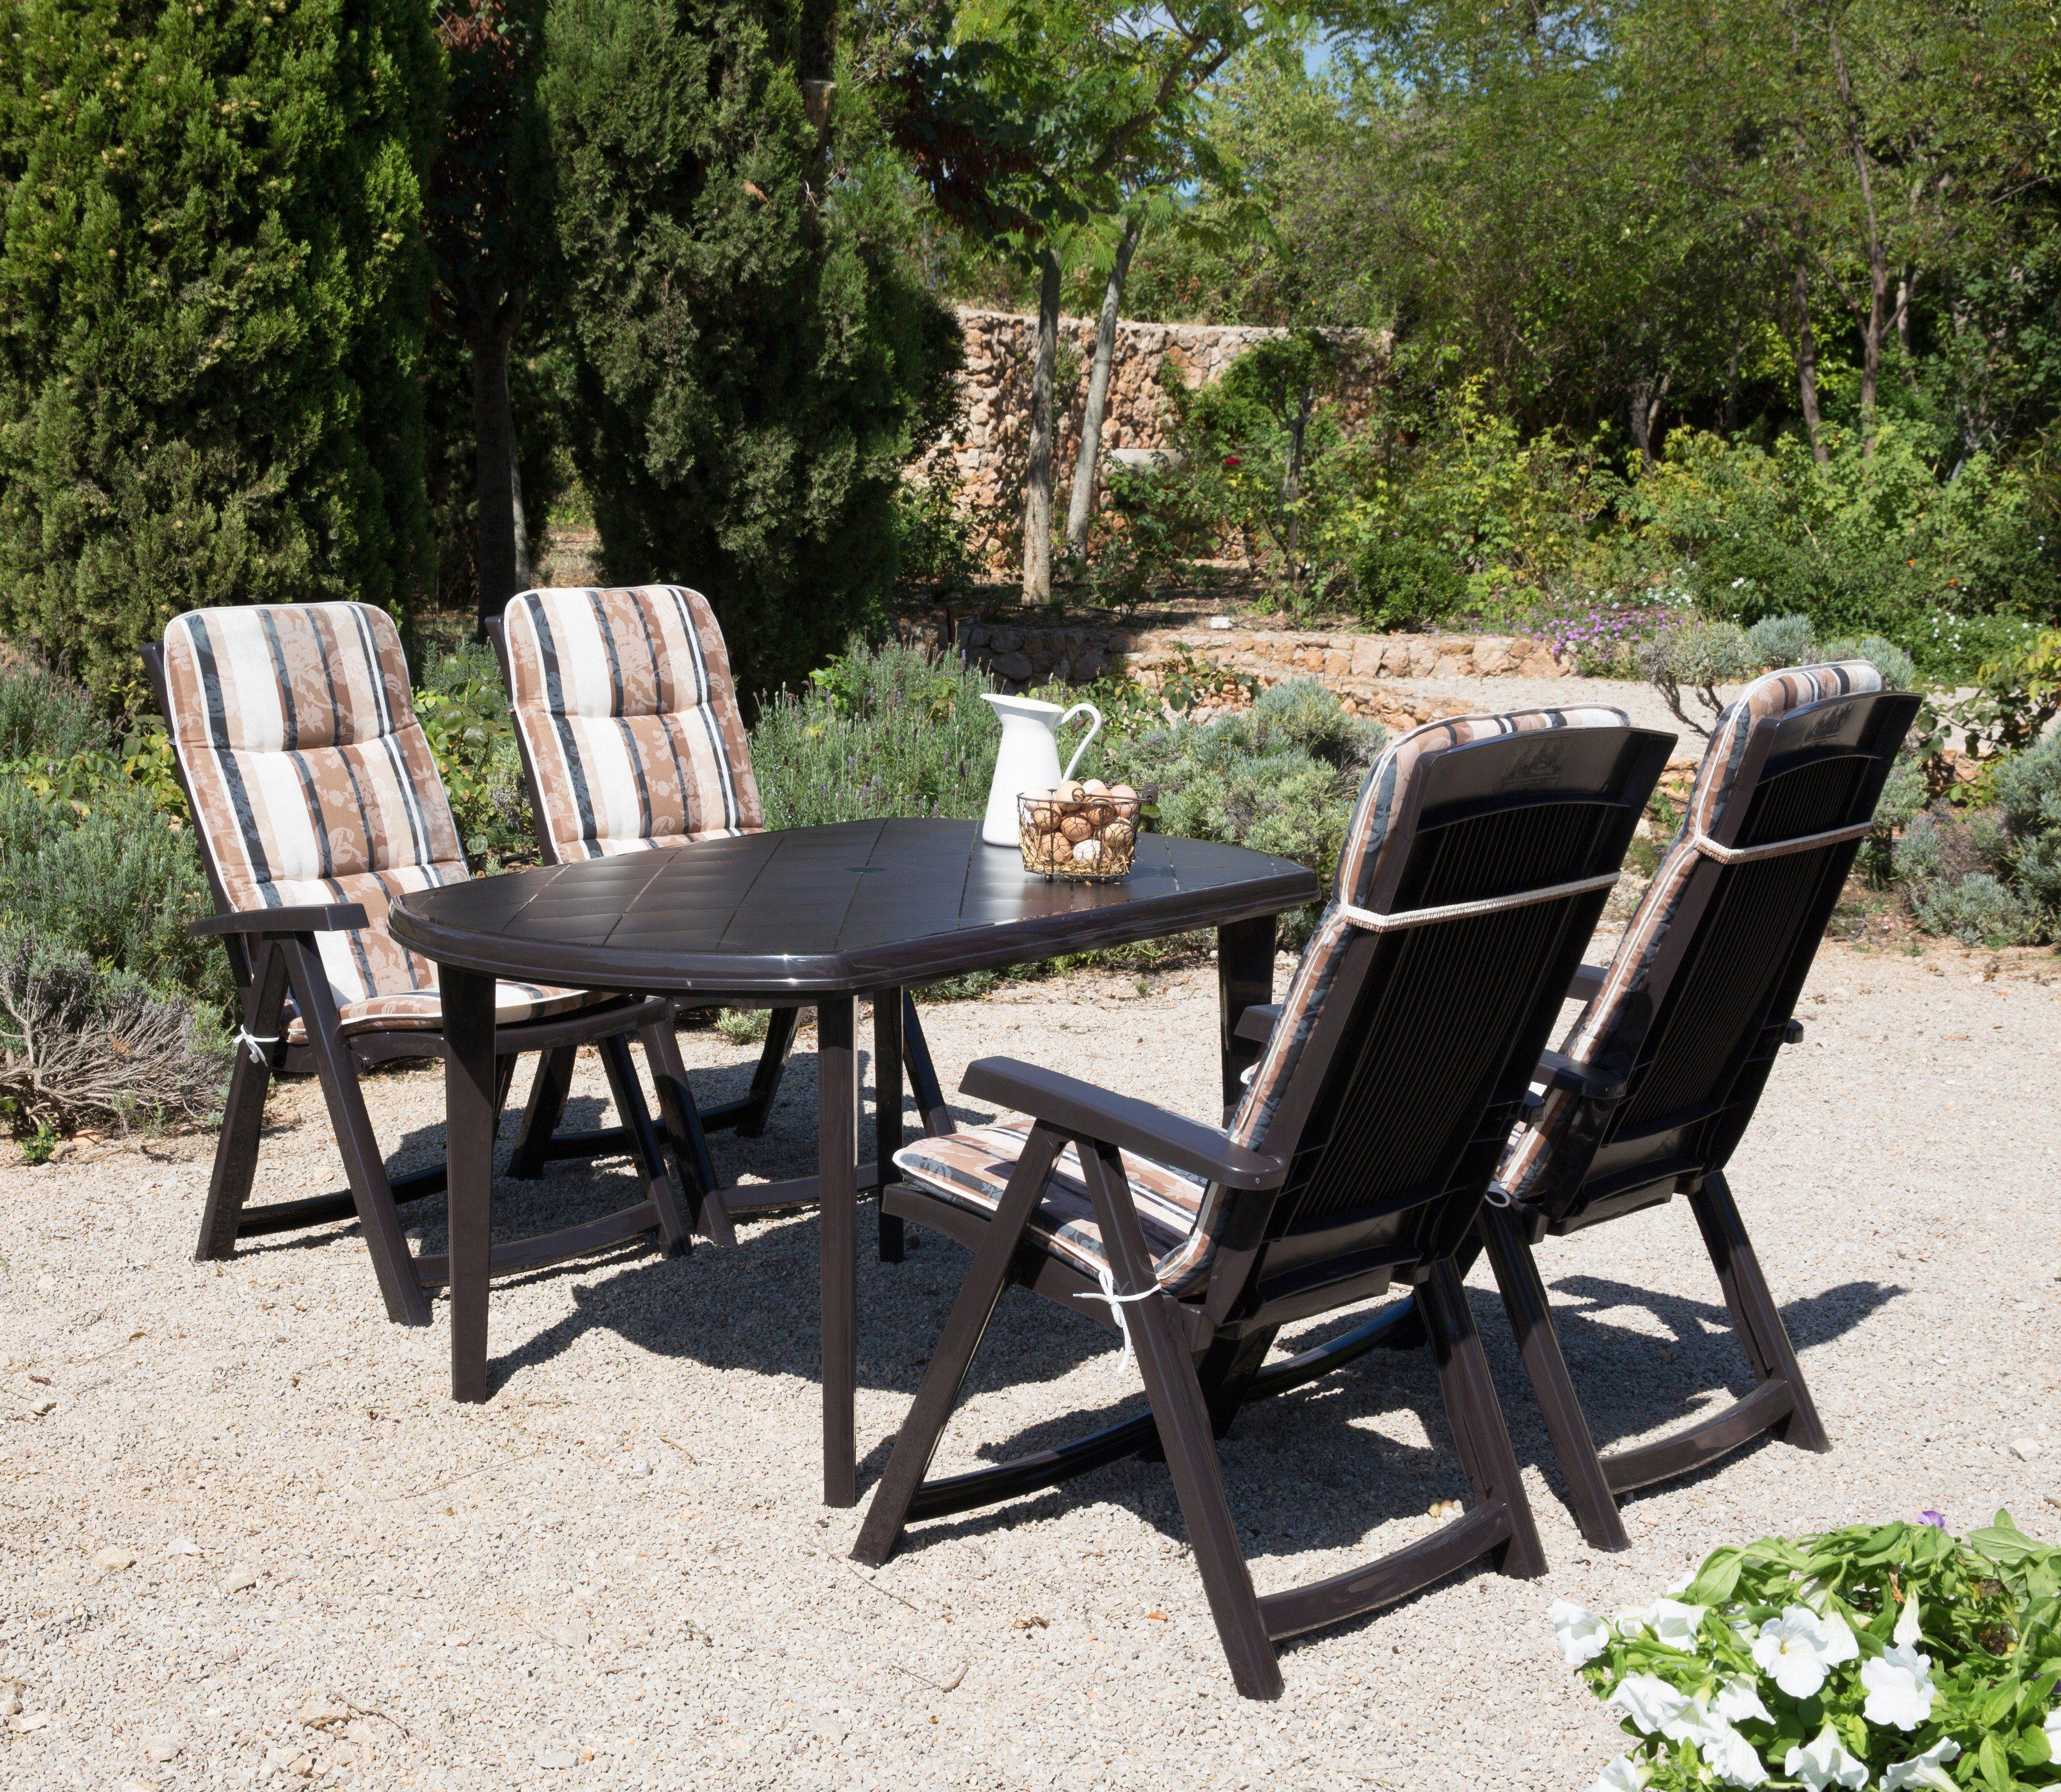 9-tgl. Gartenmöbelset »Elise«, 4 Klappsessel, Tisch 137x90 cm, Kunststoff, braun